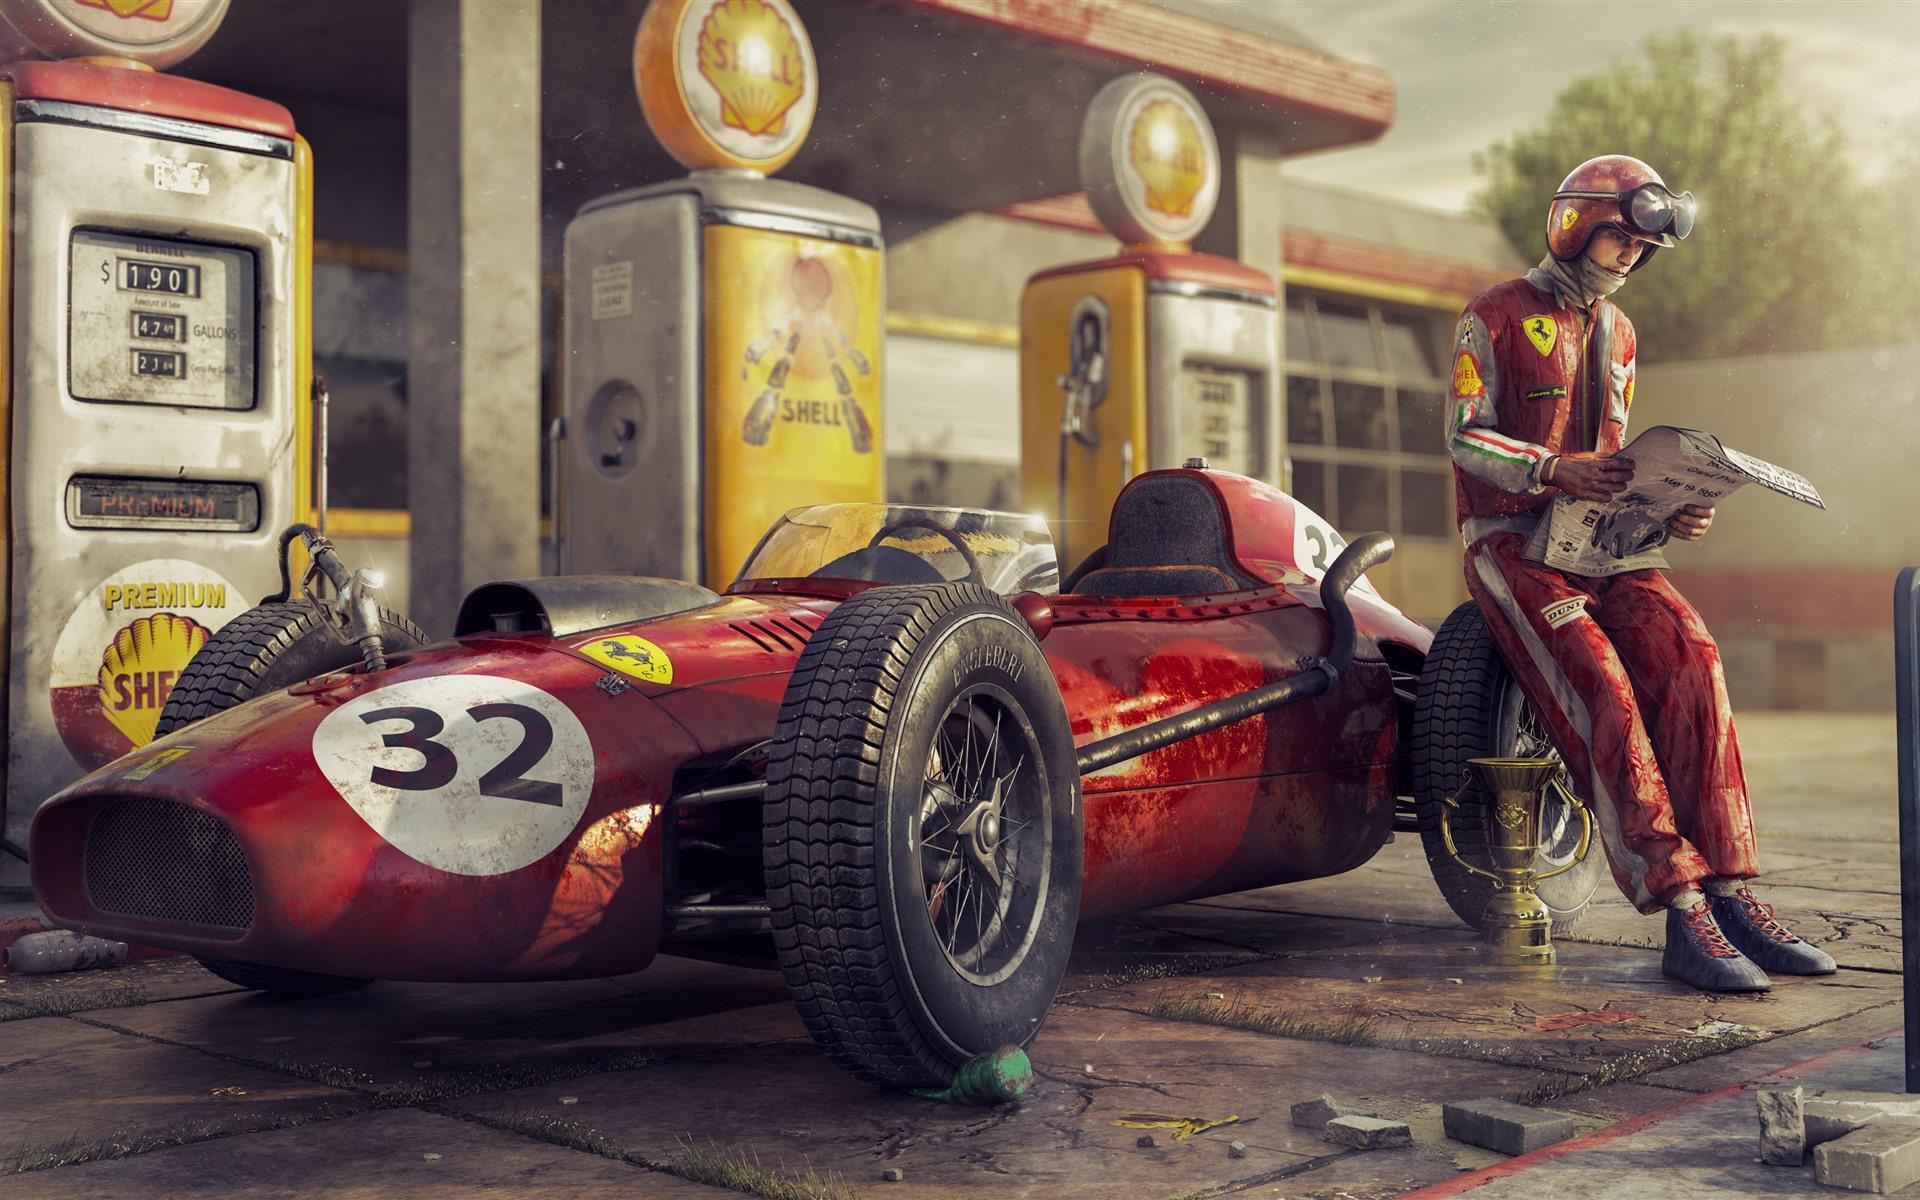 Wallpaper Ferrari F1 Racing Car Retro Driver 3840x2160 Uhd 4k Picture Image